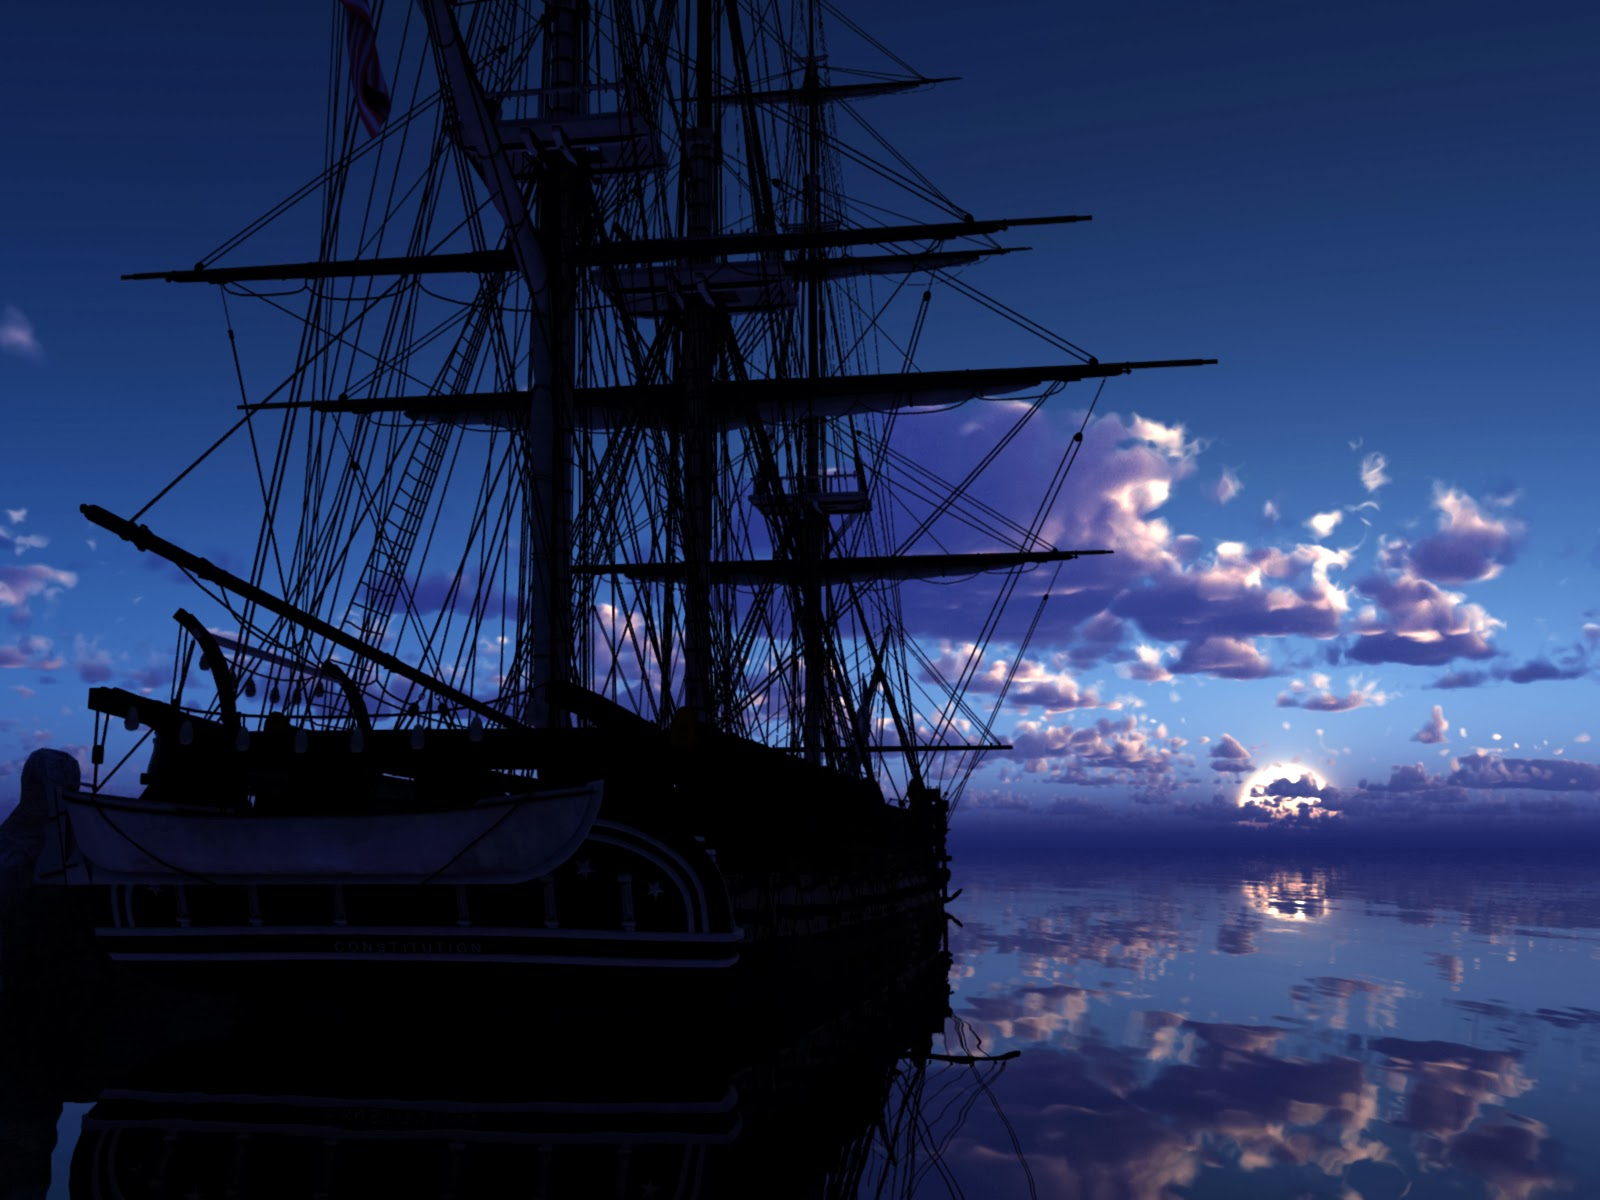 Lovable Images: Beautiful Sea & Sky & Sailing Ships